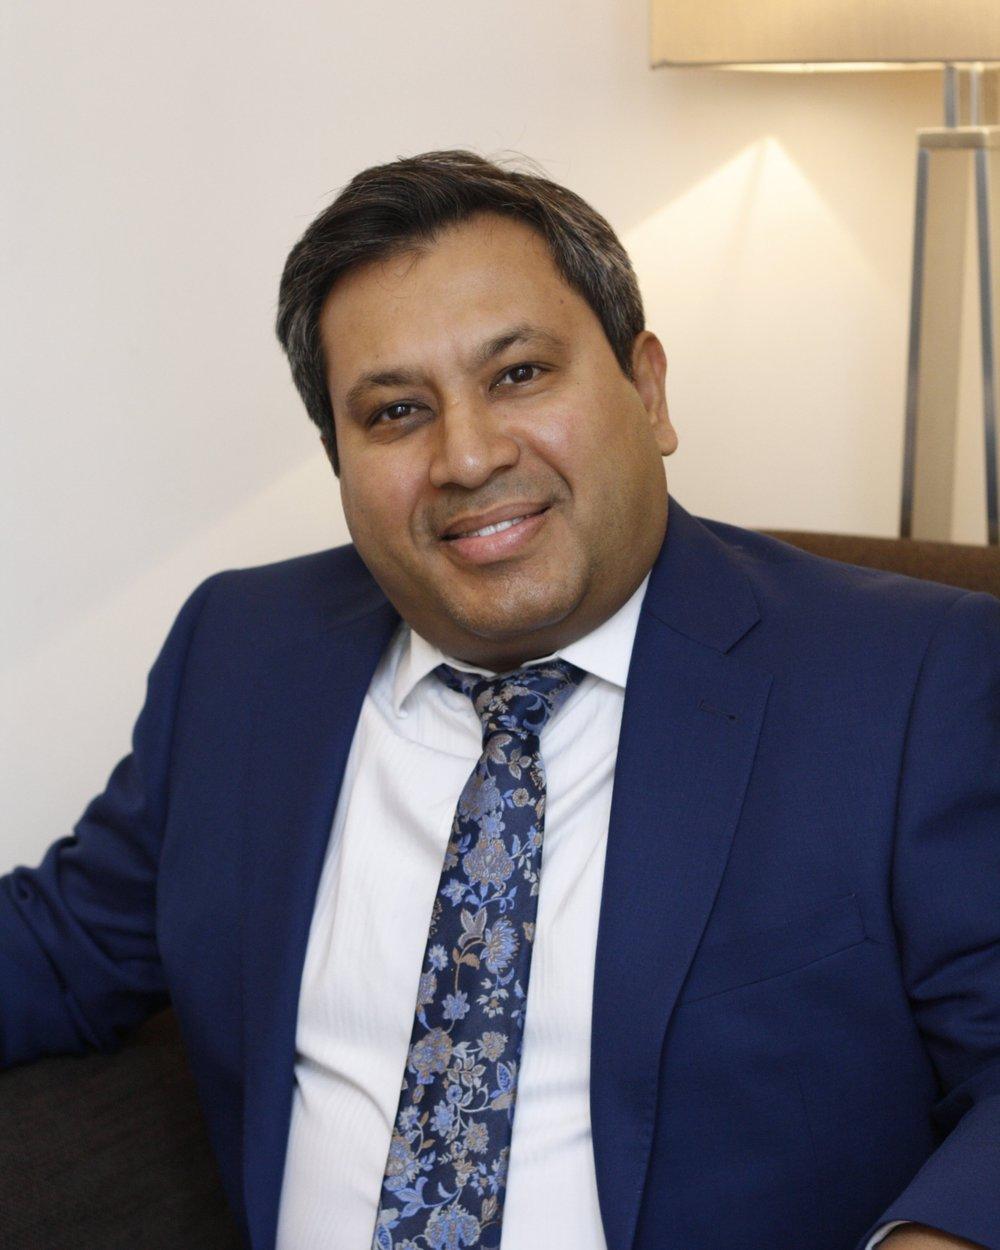 Our lead consultant - Dr. Arghya Sarkhel -